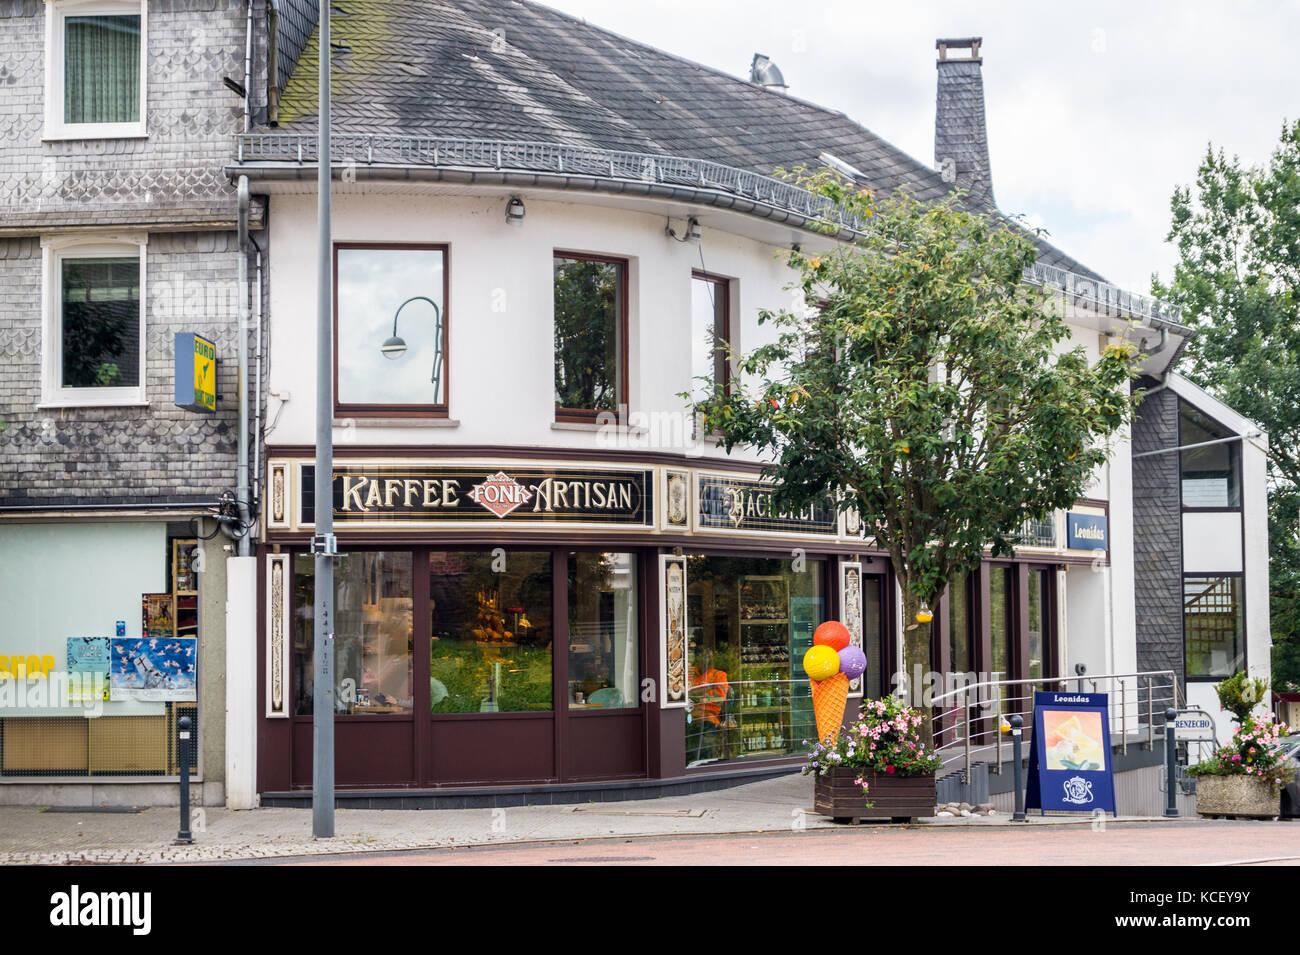 Bäckerei- Konditorei Fonk, exterior, St. Vith, Ostbelgien (Cantons de l'Est), Belgium Stock Photo